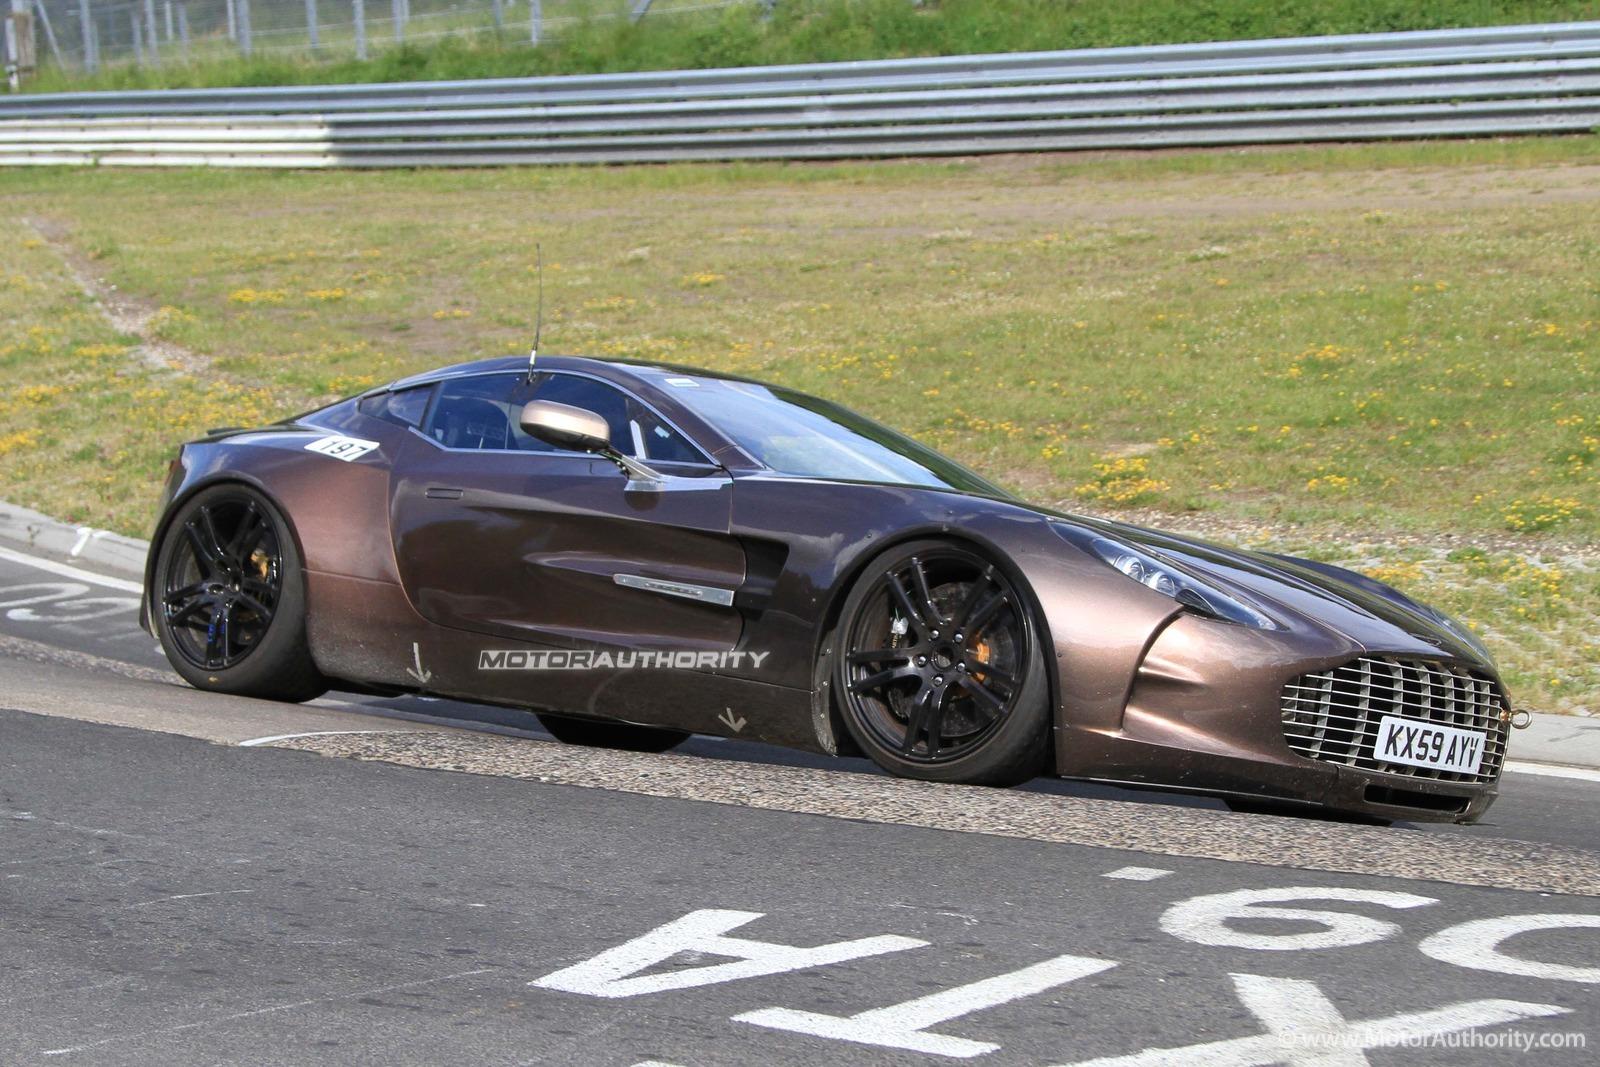 Spy Shots Aston Martin One 77 Testing At The Nurburgring